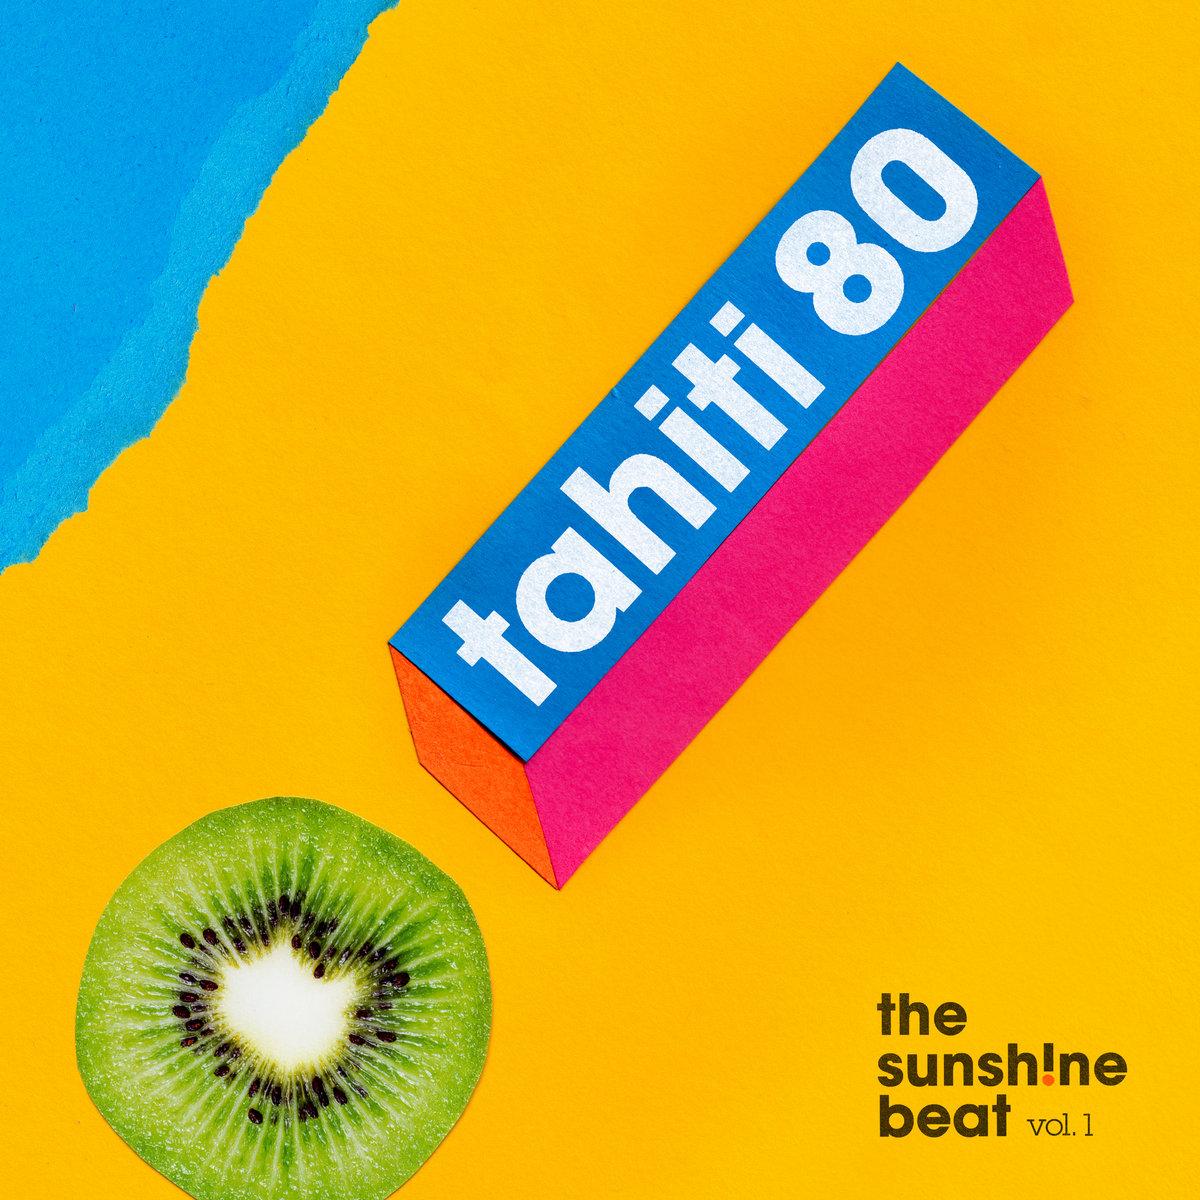 Image result wey dey for Tahiti 80 – The Sunshine Beat, Vol. 1 Zippyshare Mp3